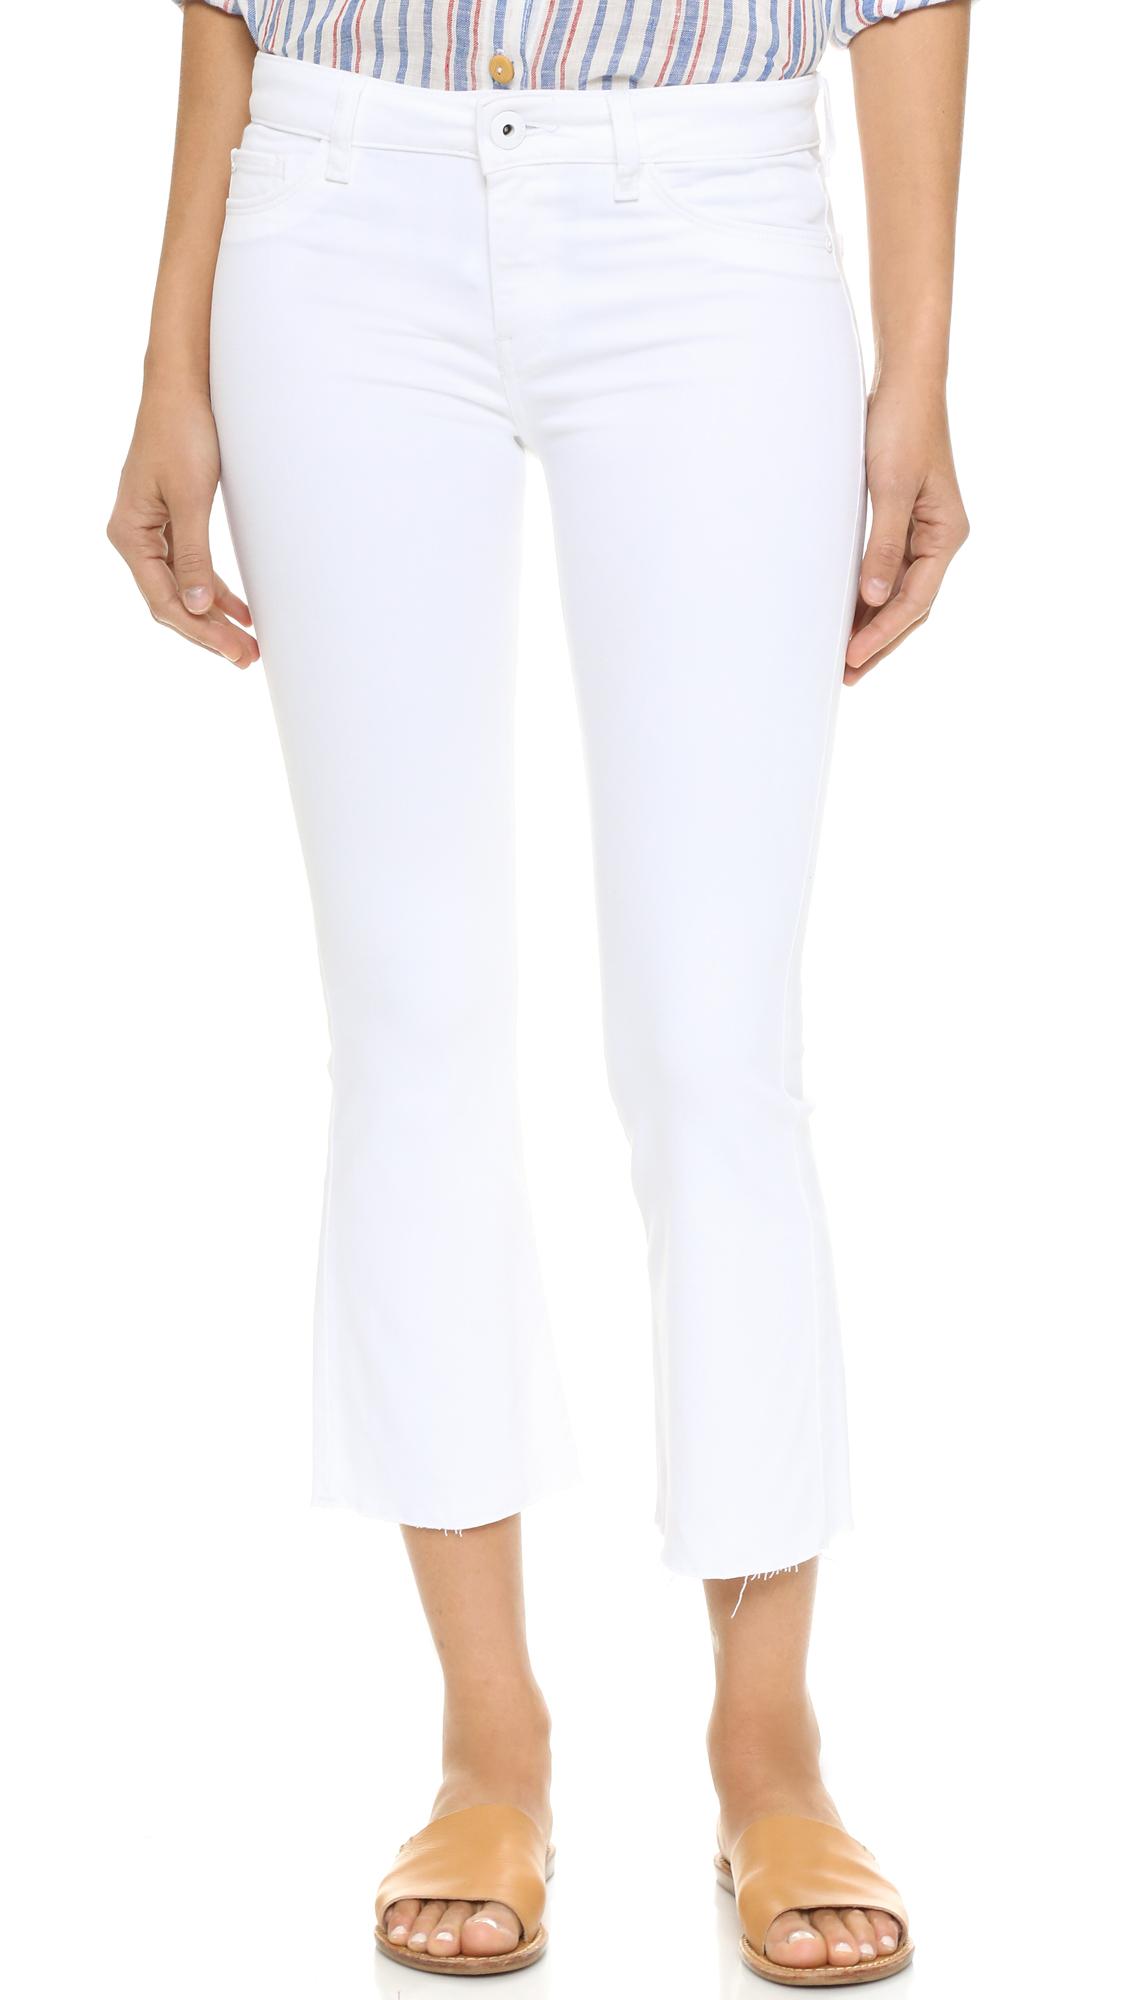 2a40618ba4d DL1961 Lara Cropped Flare Jeans